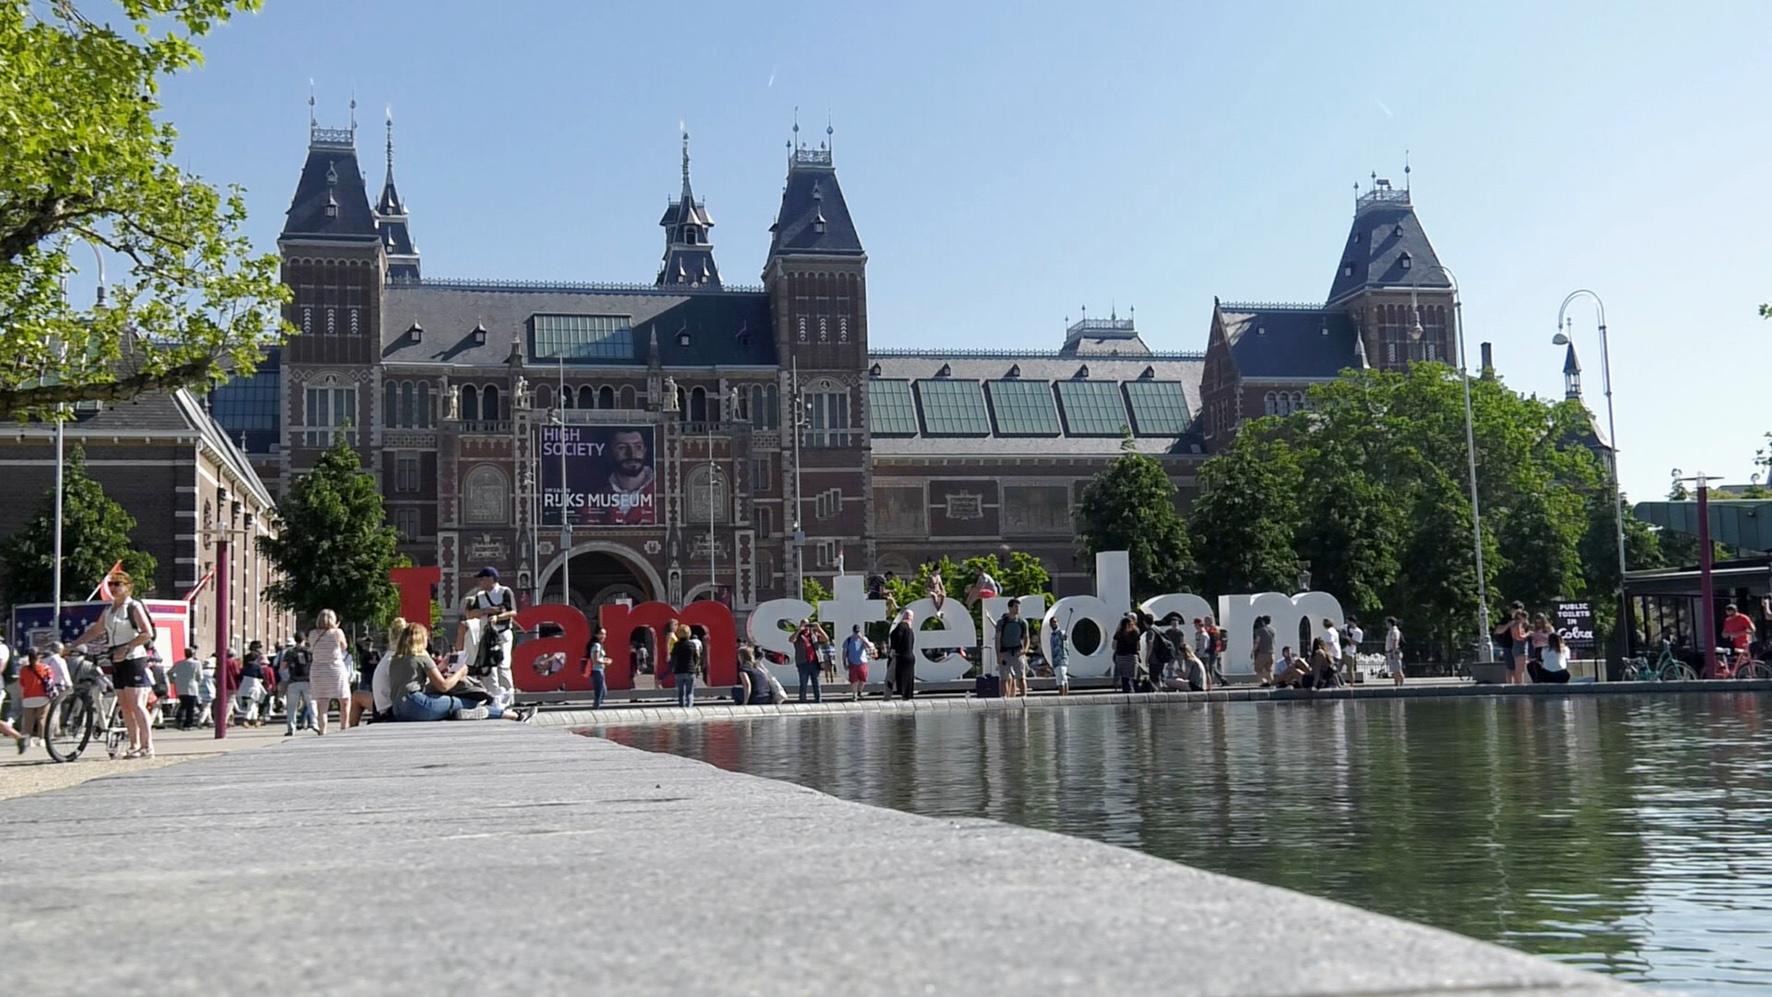 Españoles en el mundo - Próximo destino: Holanda